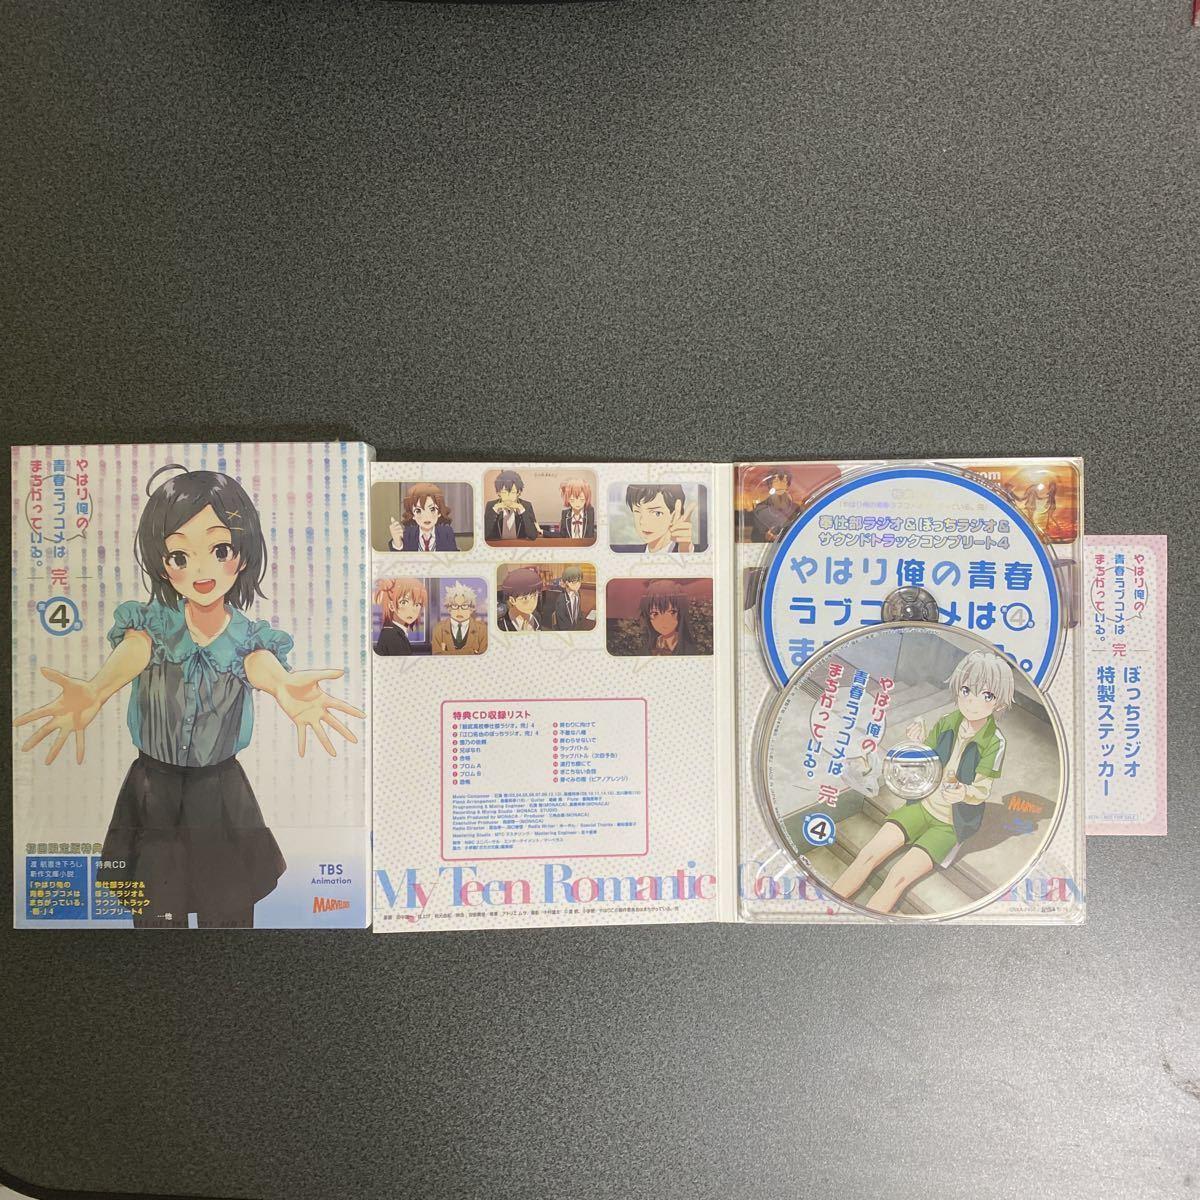 BD やはり俺の青春ラブコメはまちがっている。 完 初回限定版 全6巻(Blu-ray Disc) 小説欠品